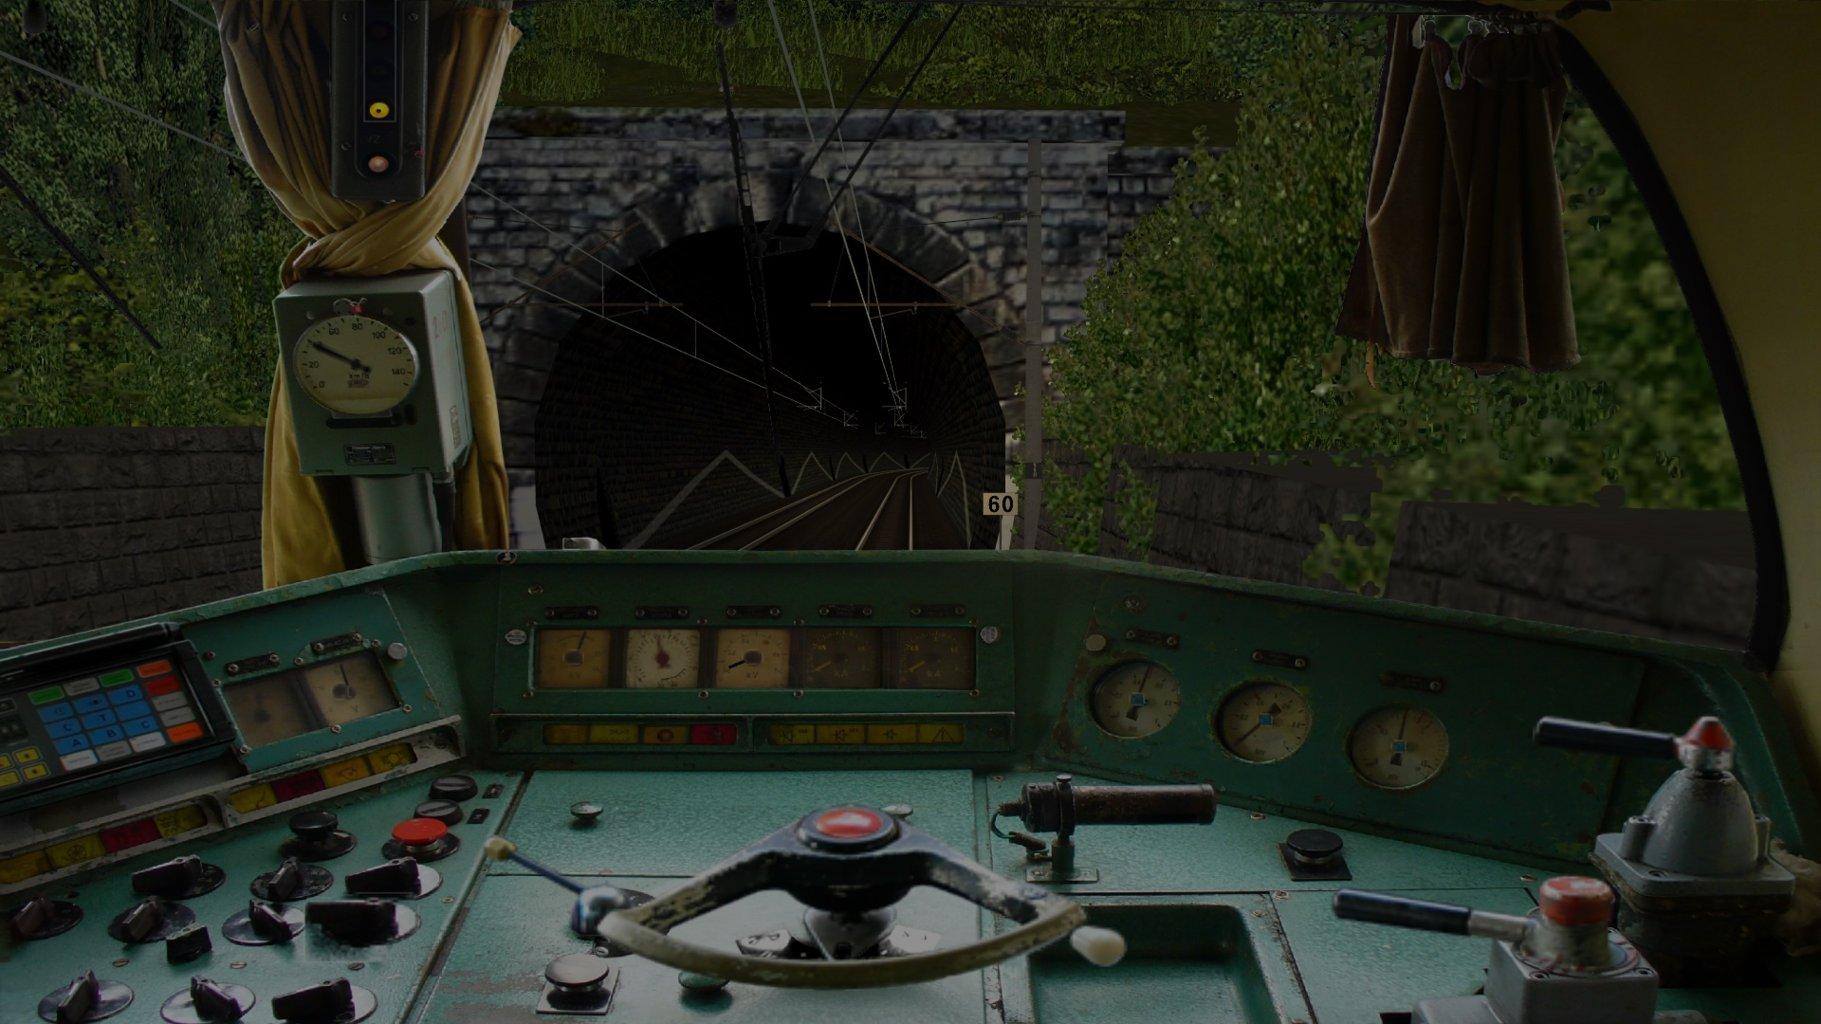 Open Rails 2021-04-06 09-38-04.jpg